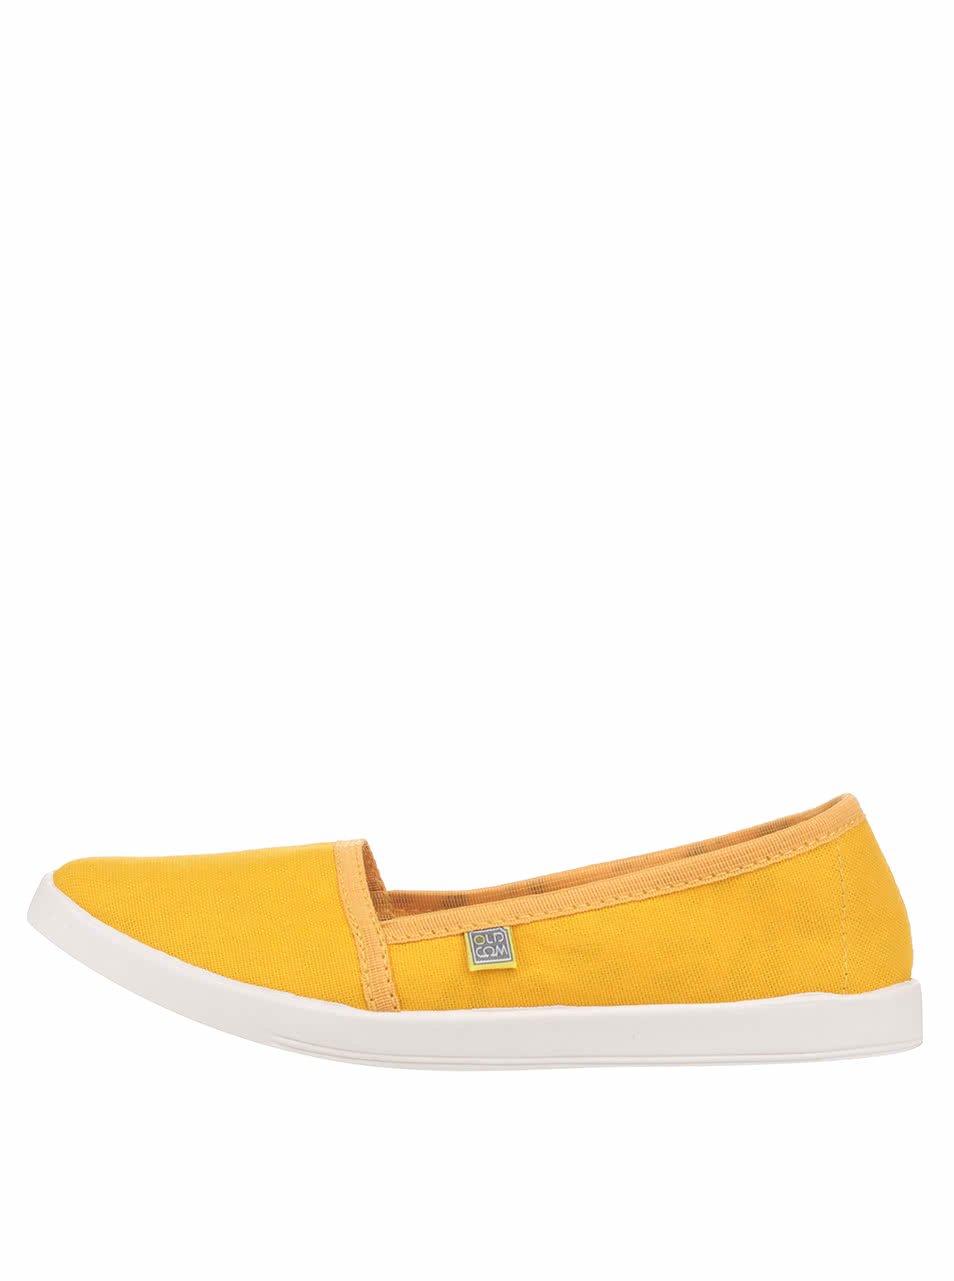 Žluté dámské loafers Oldcom Canvas